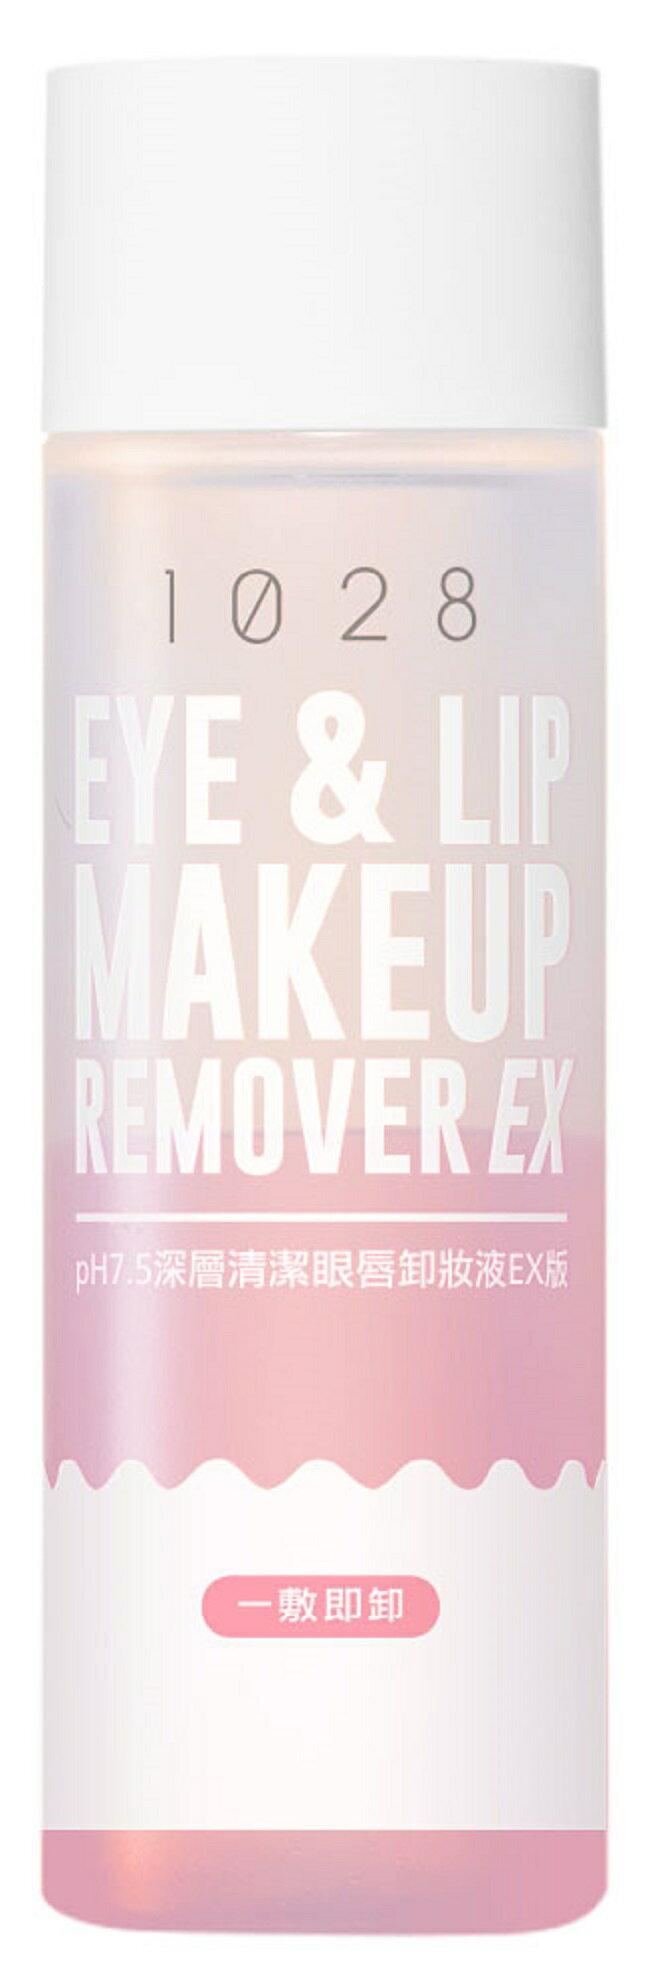 1028 pH7.5 深層清潔眼唇卸妝液EX版90ml